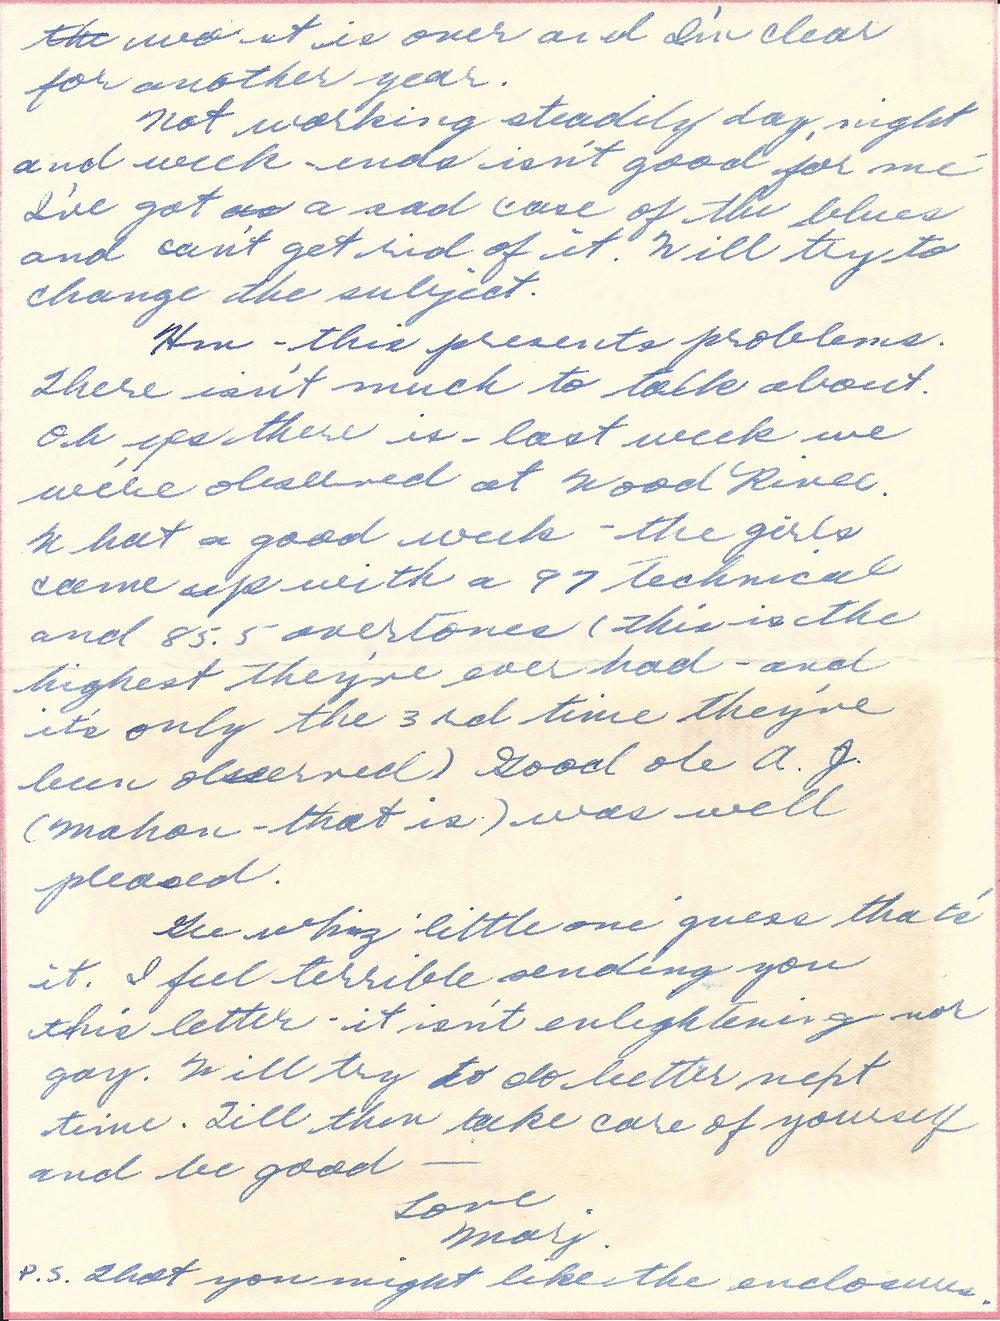 Feb. 22, 1953 (Marj) Page 3